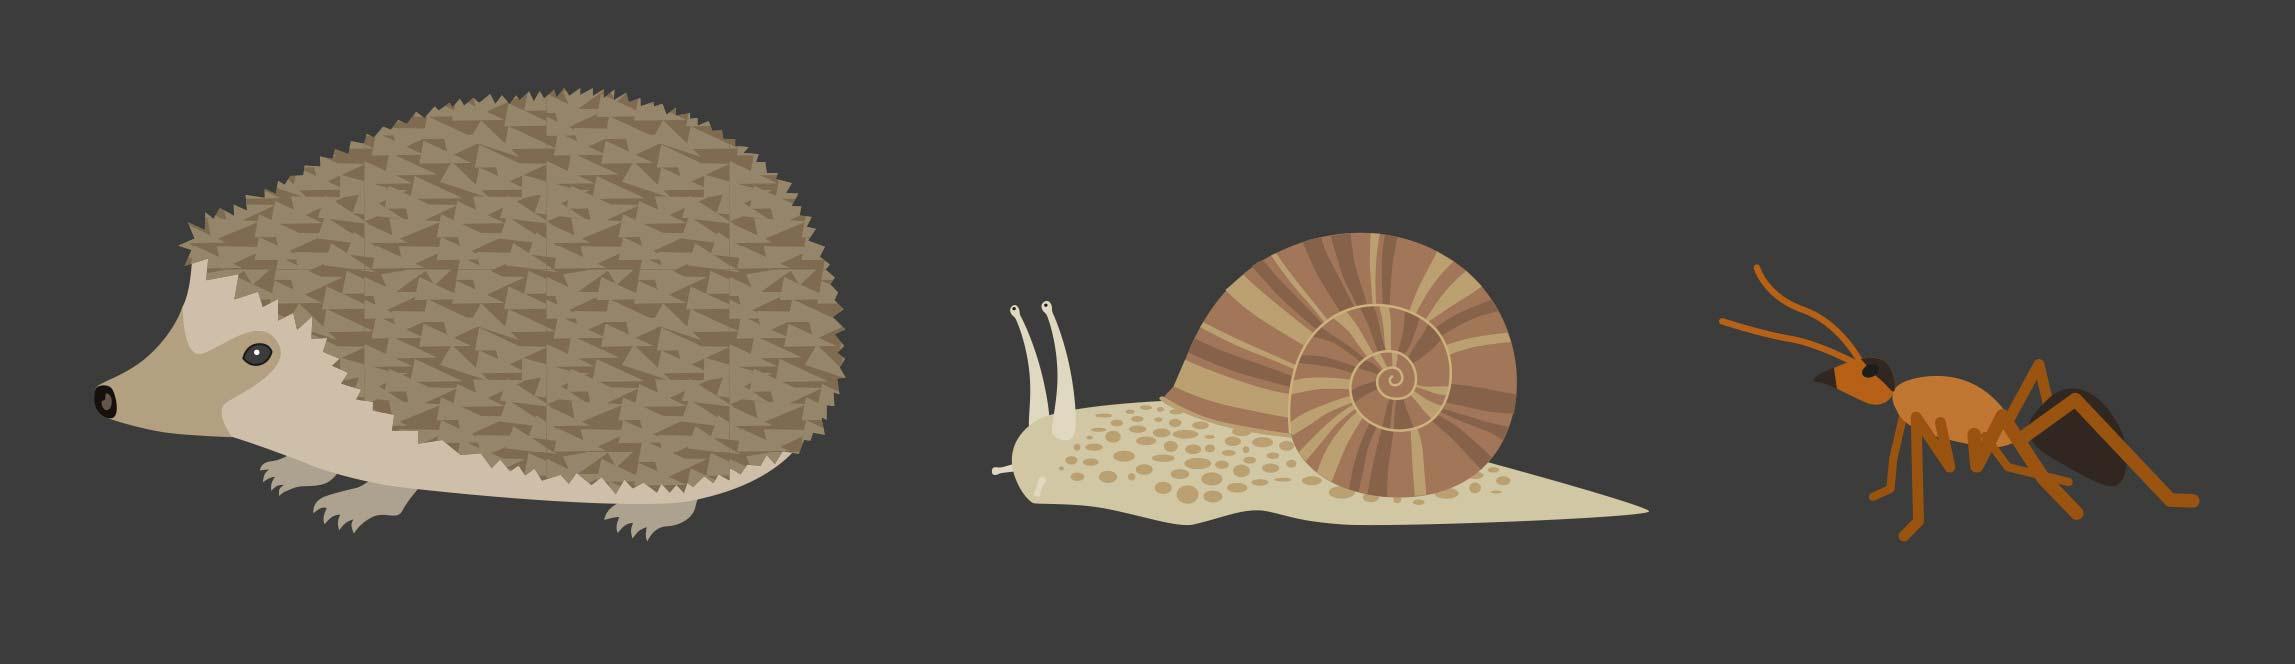 Illustrationen Tiere Signaletik Gurten